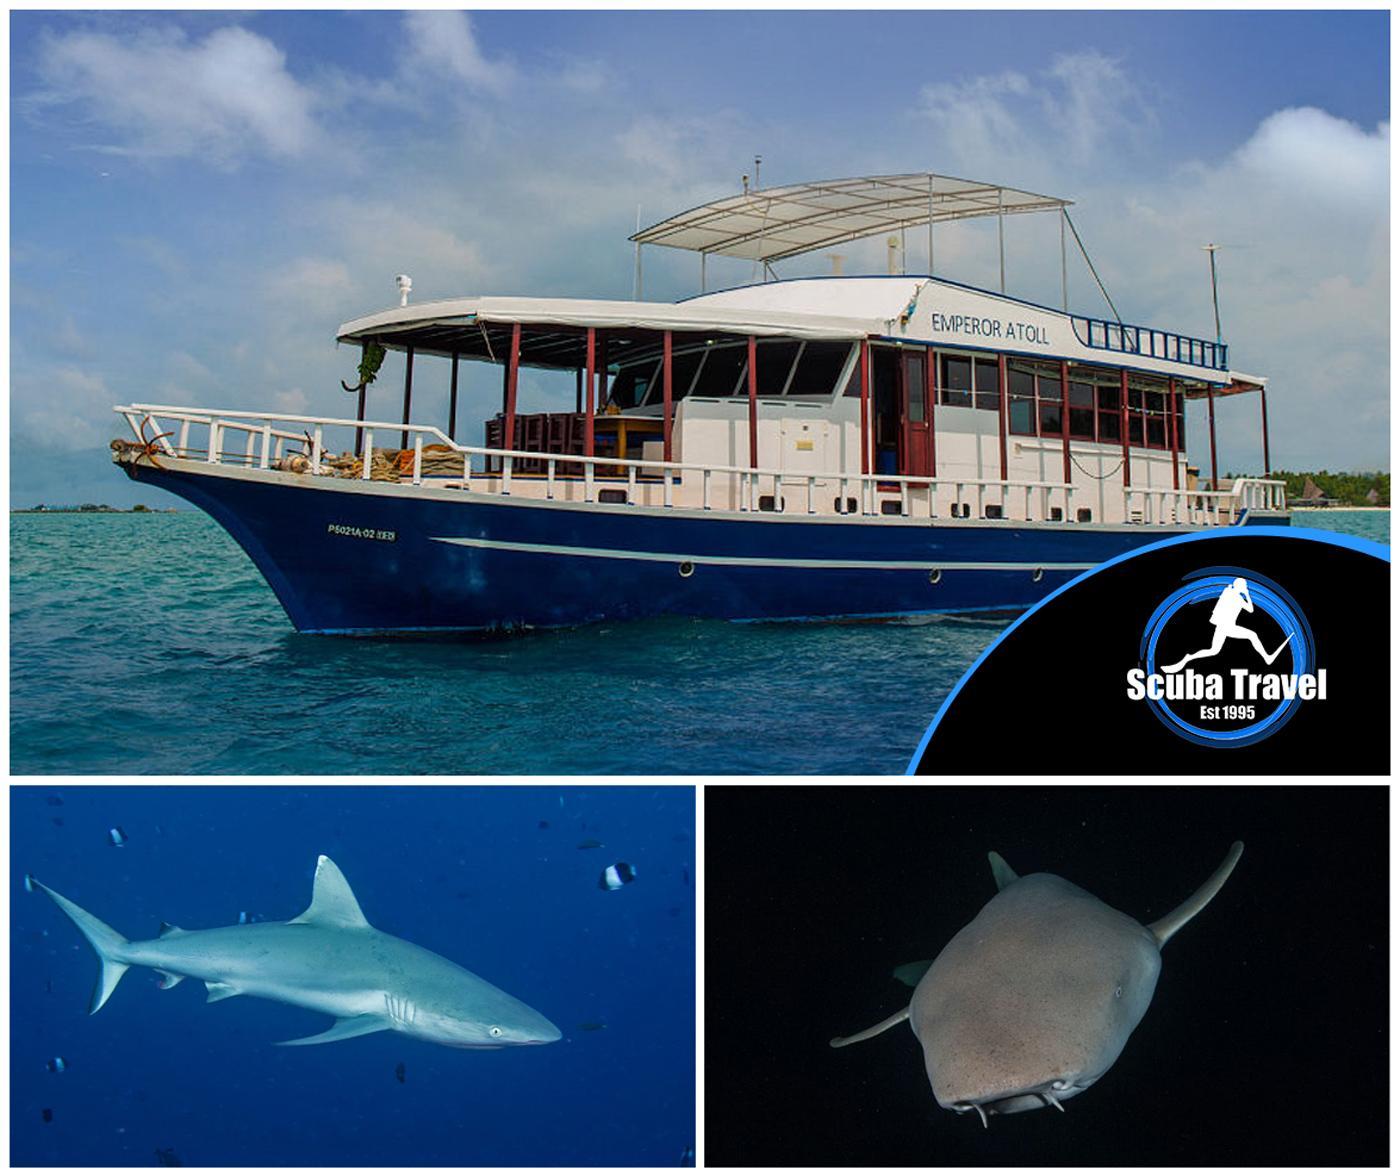 Scuba Travel, Maldives, Emperor Atoll, Sharktastic